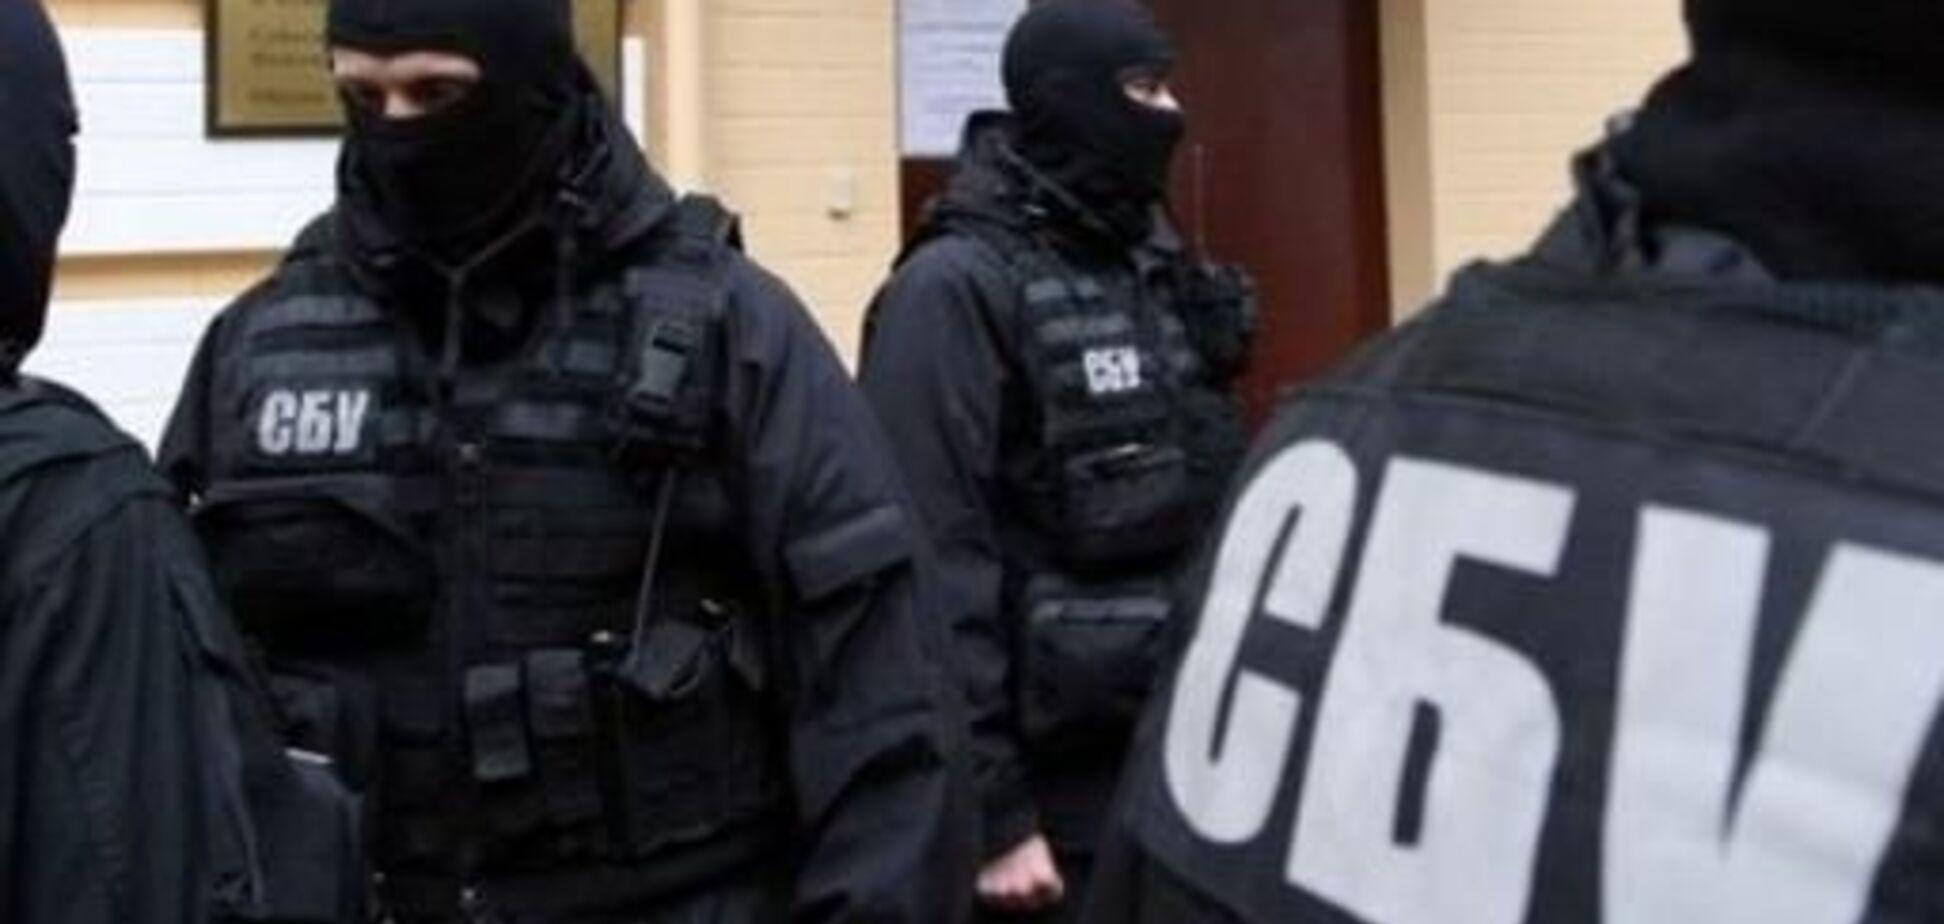 Лил грязь на Украину: СБУ нагрянула к скандальному журналисту